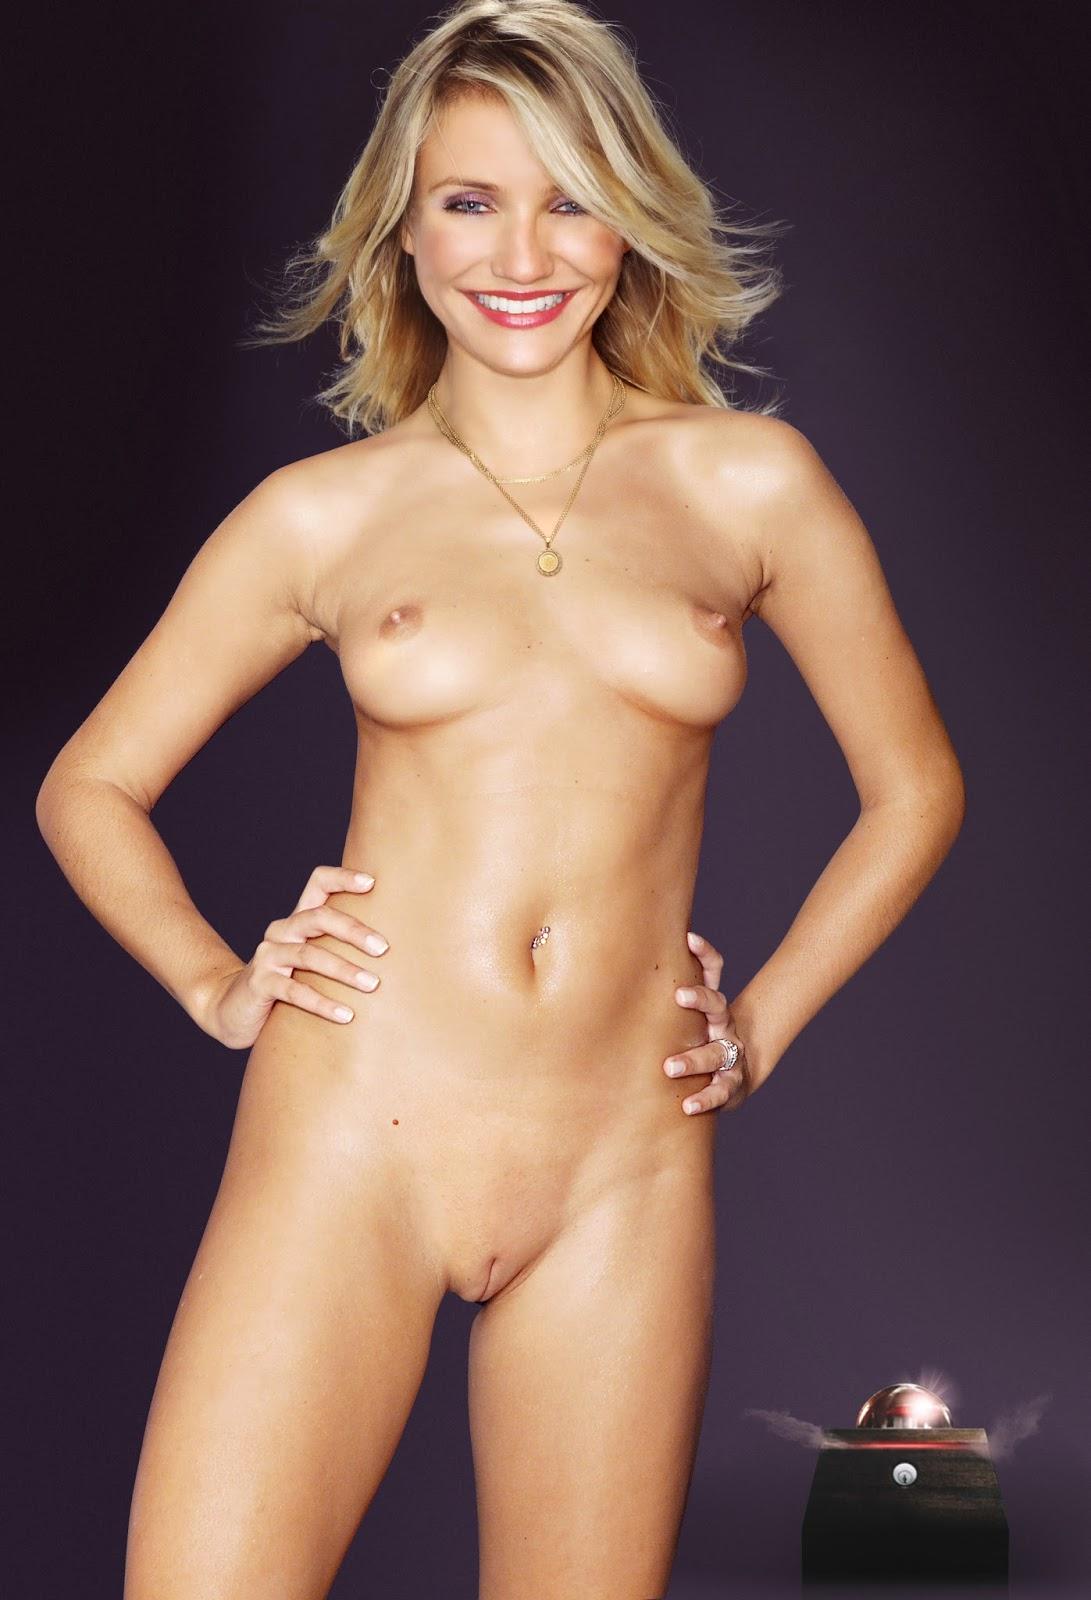 Adriana lima utube sex bikini